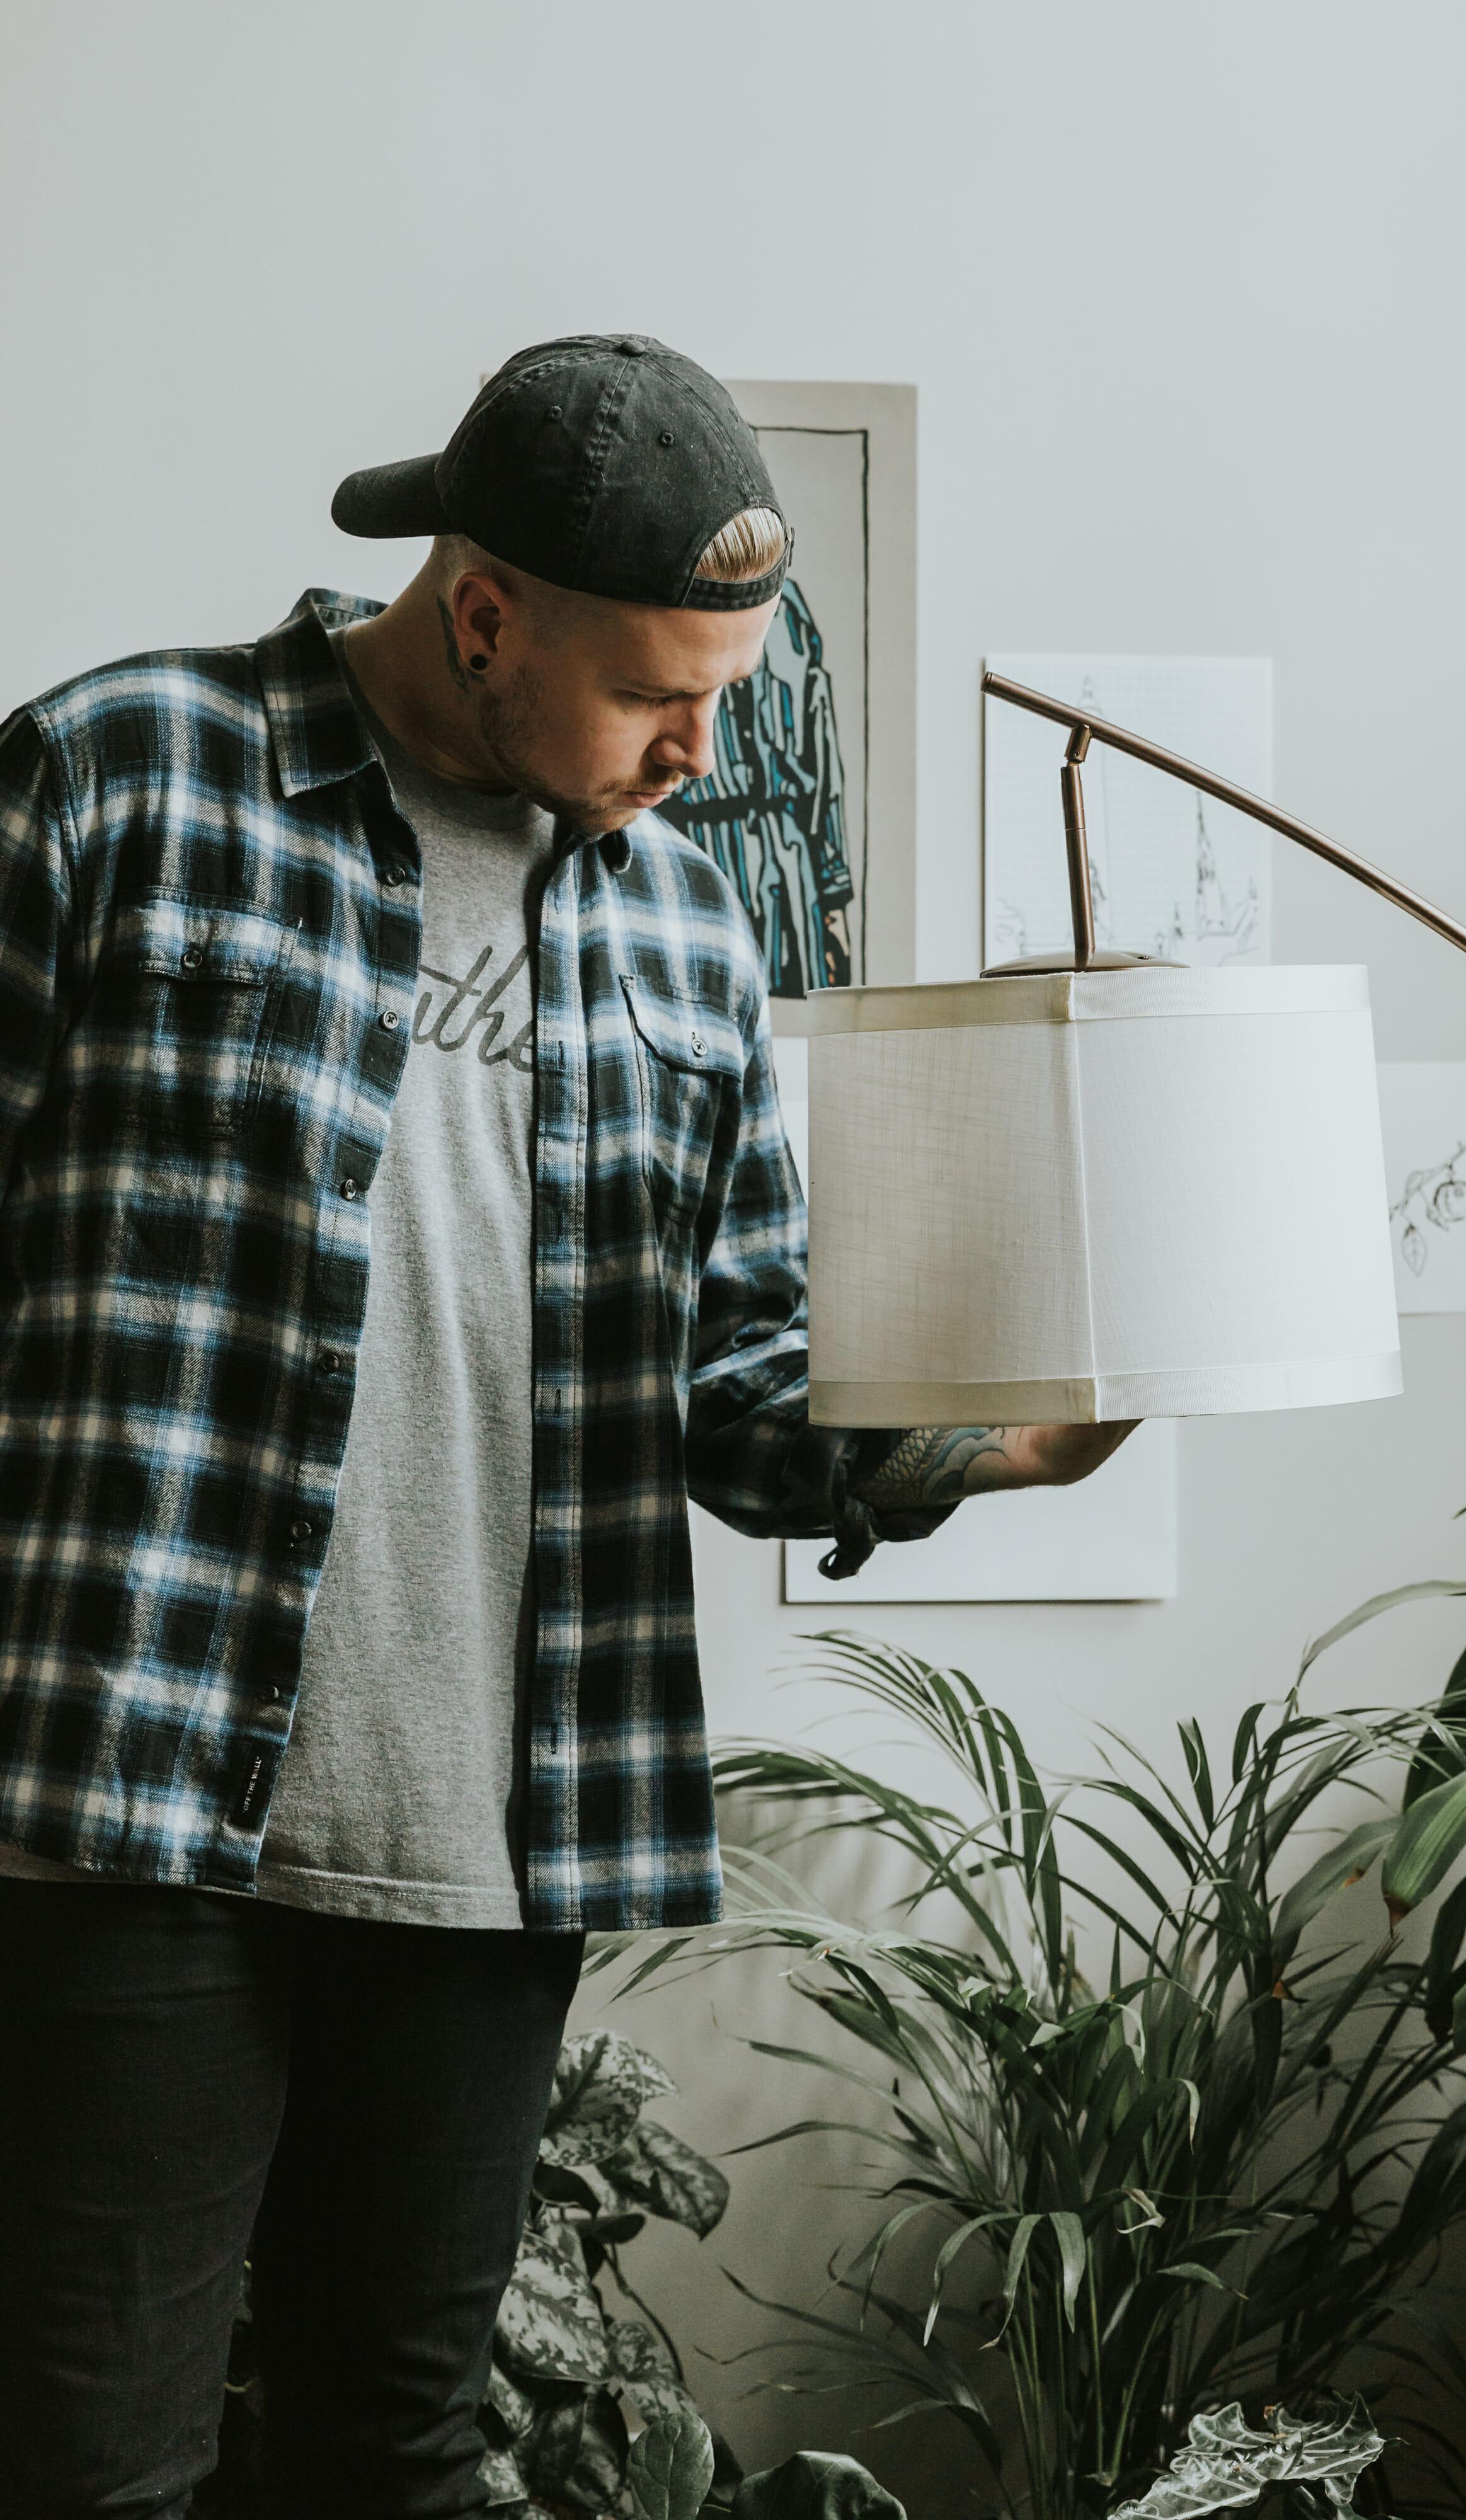 guy screwing in light bulb